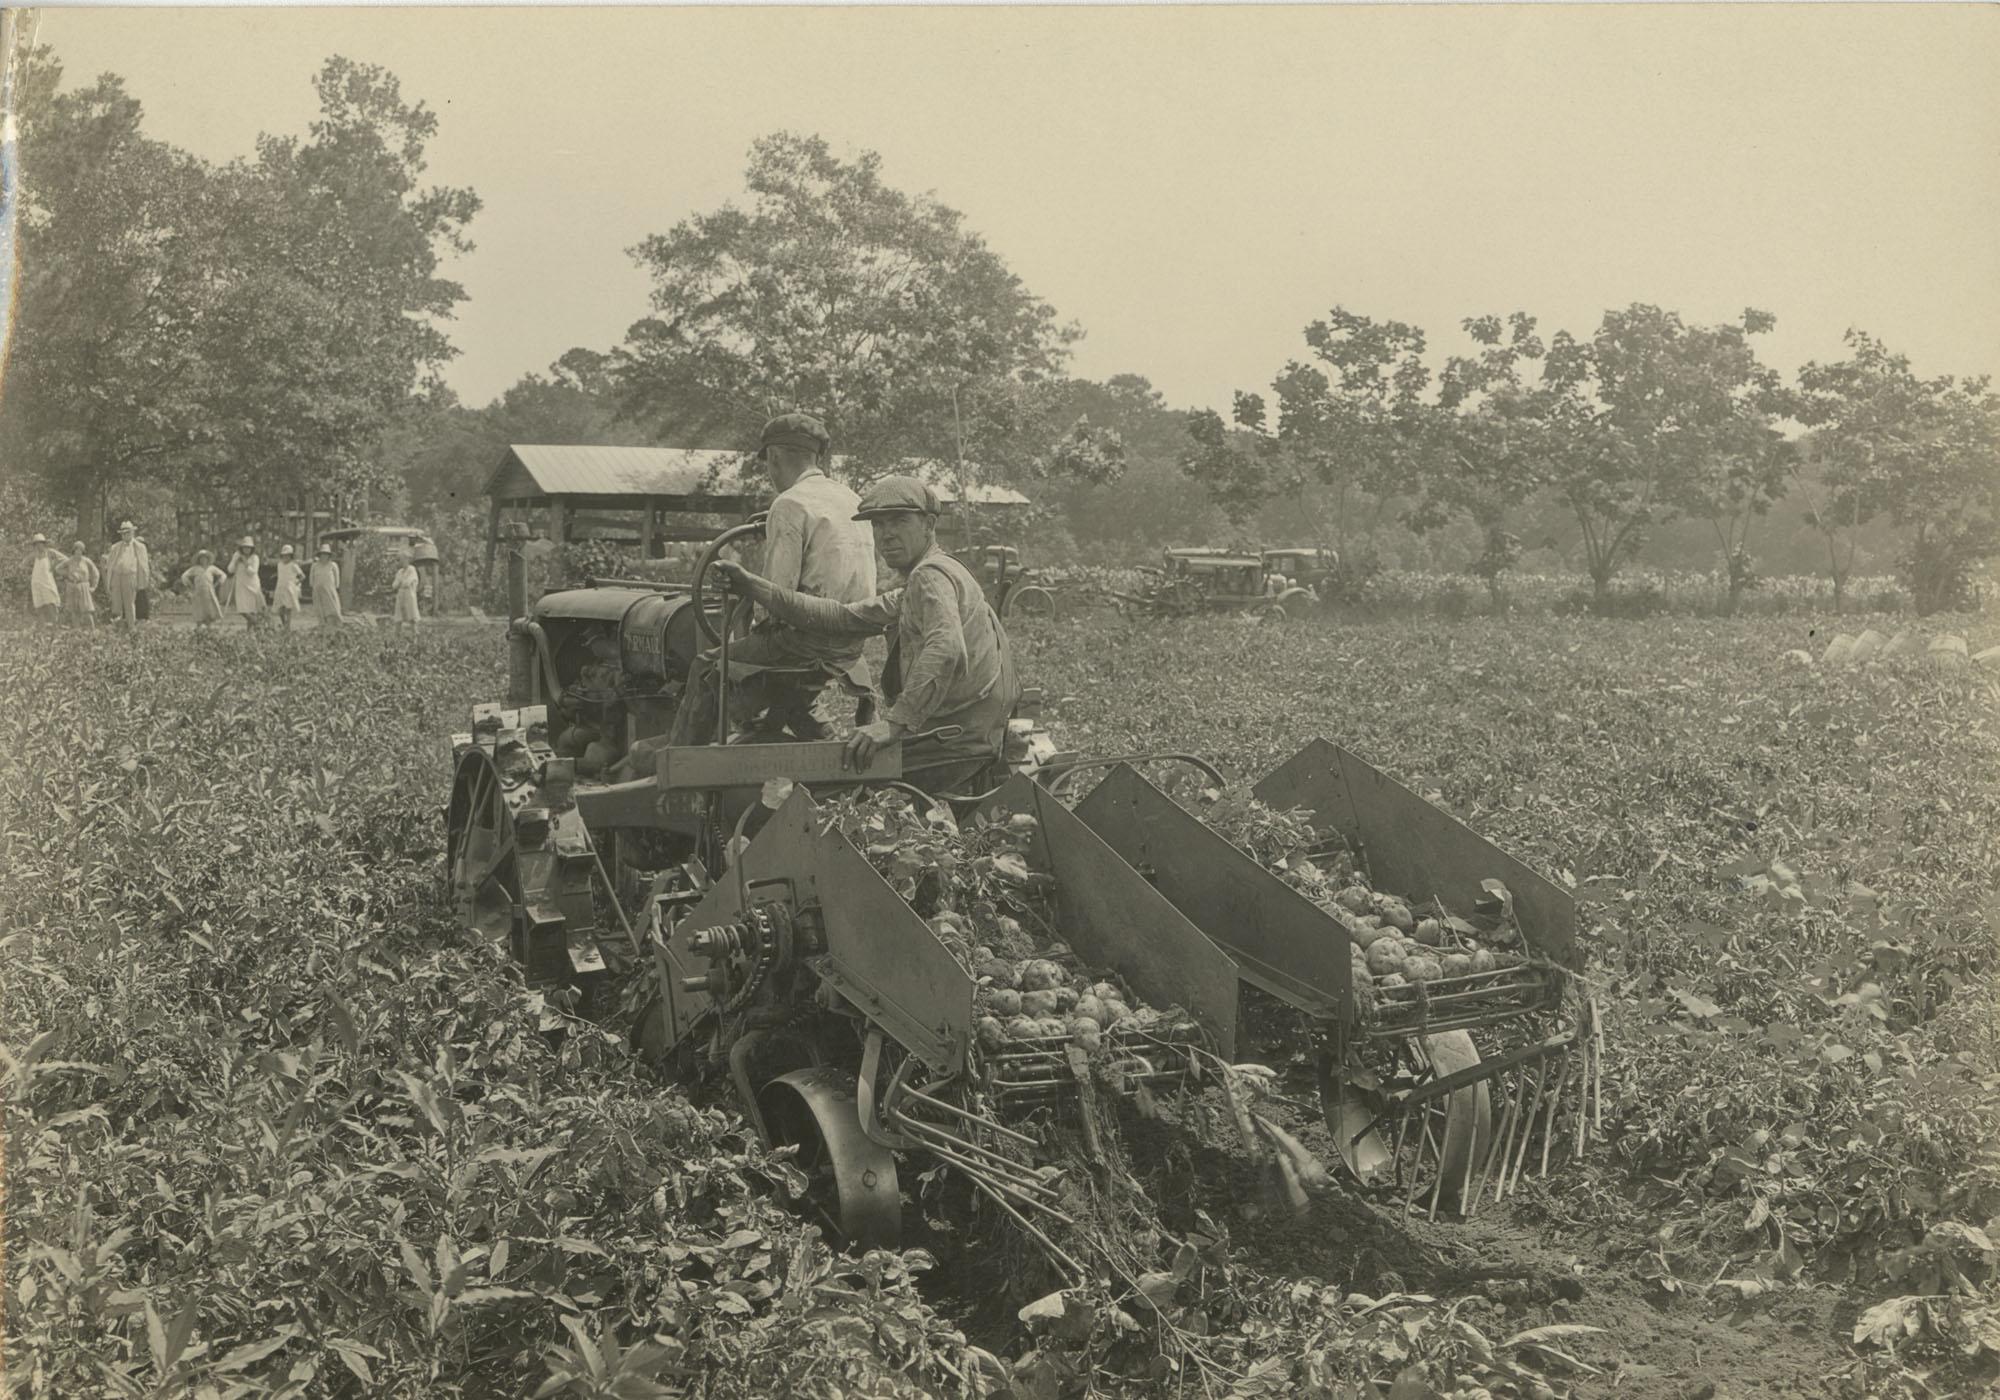 Men Harvesting Potatoes on Machinery